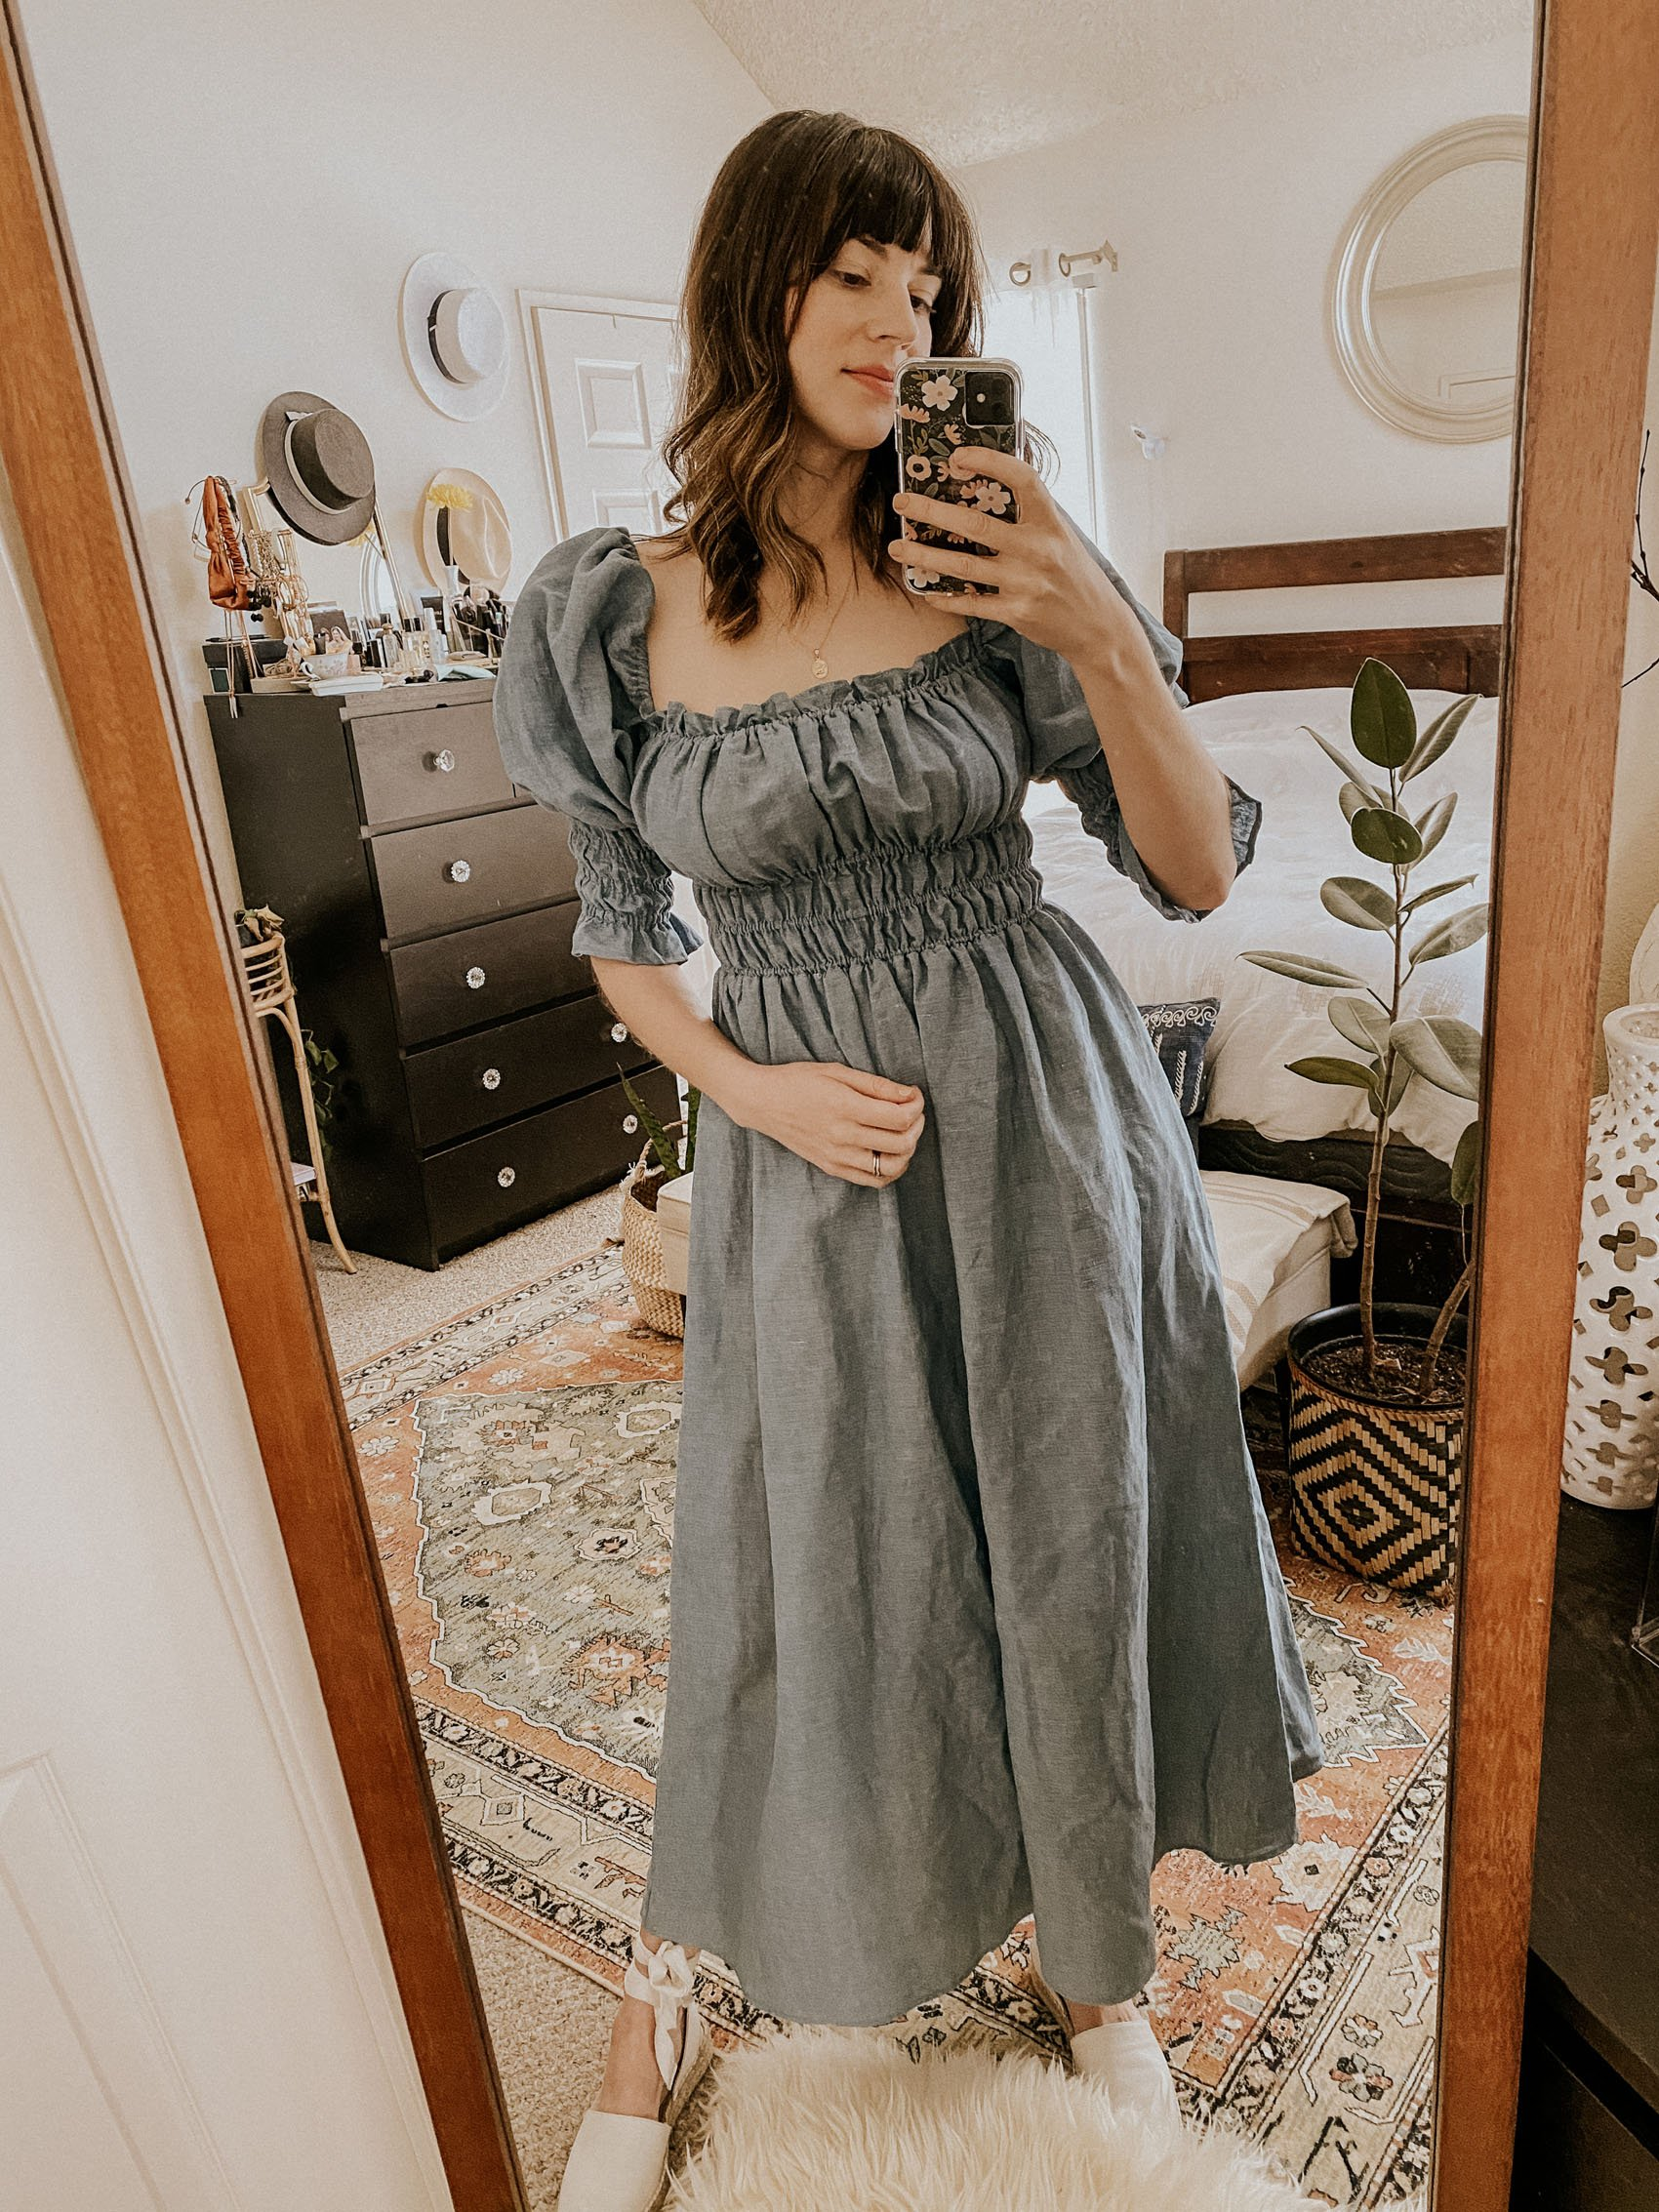 The Best Shirred Dresses Damaris Bailey